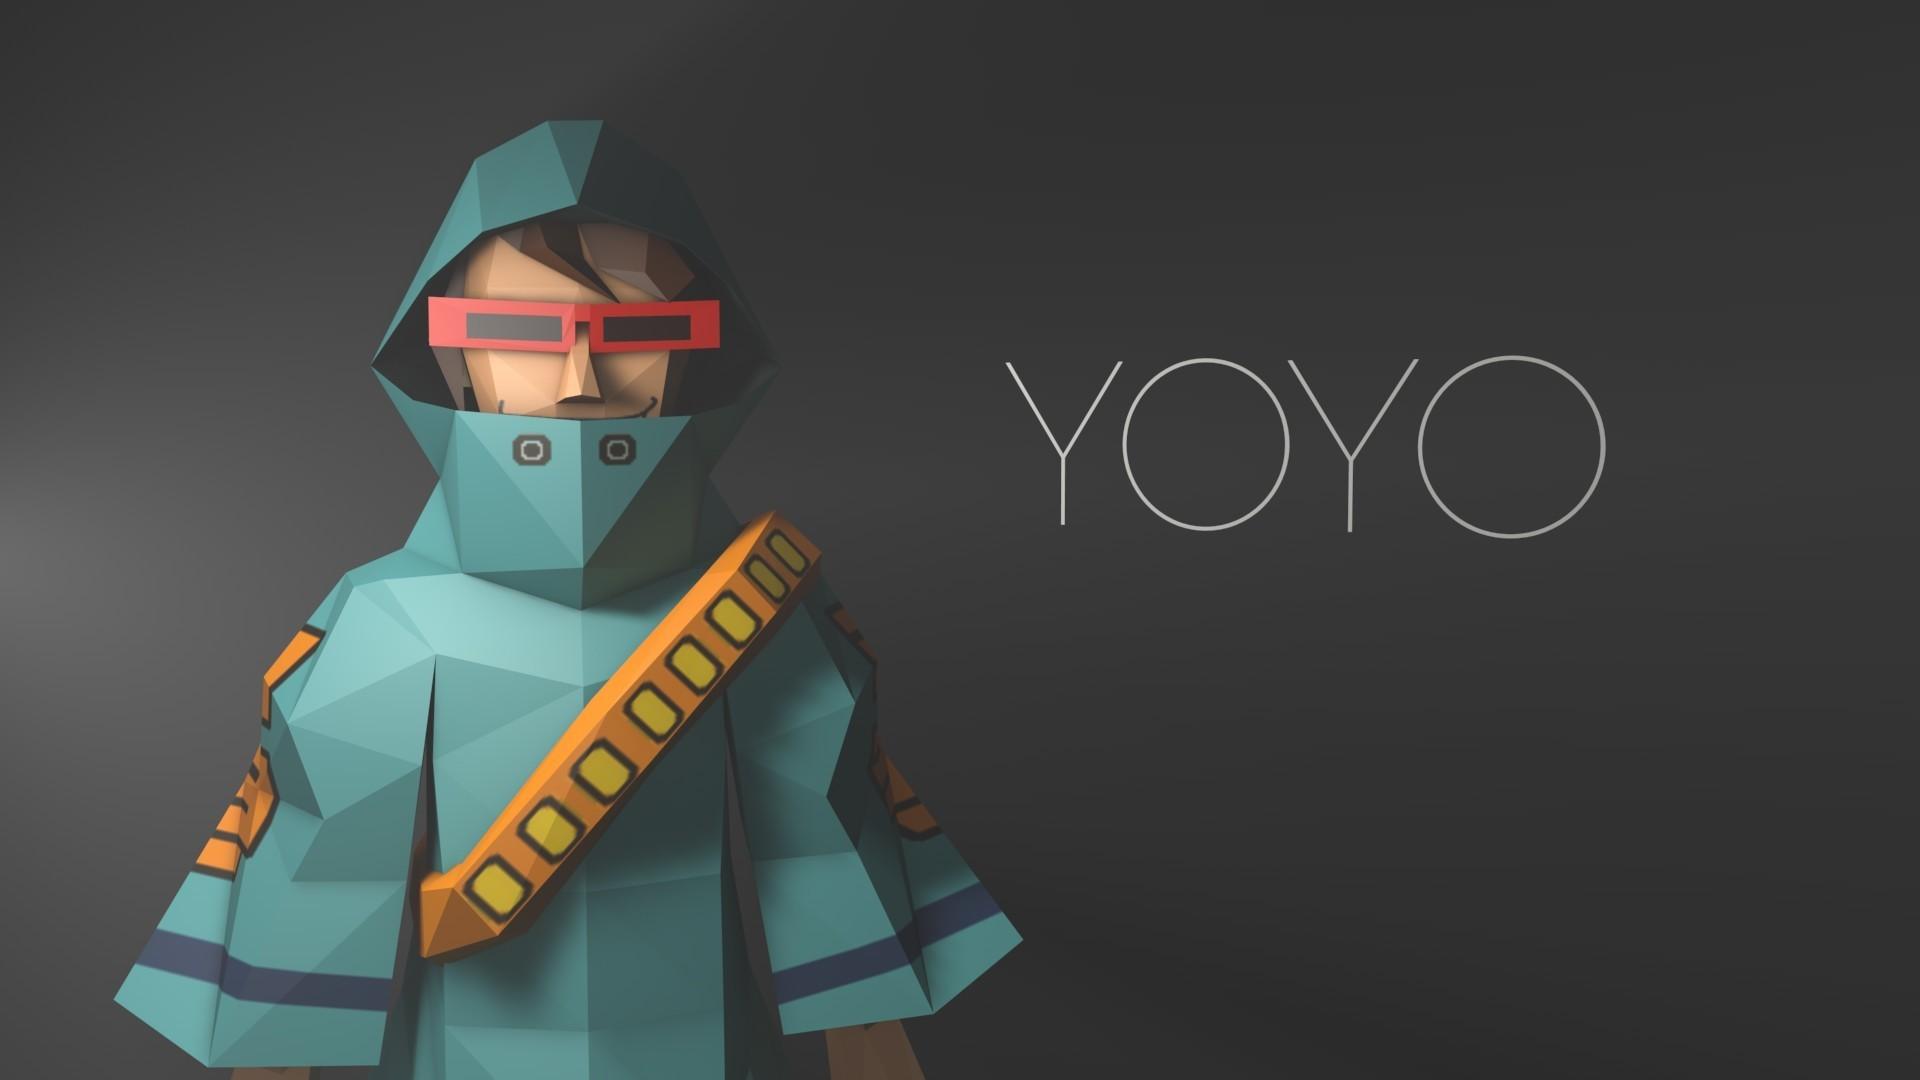 Yoyo Wallpapers ①